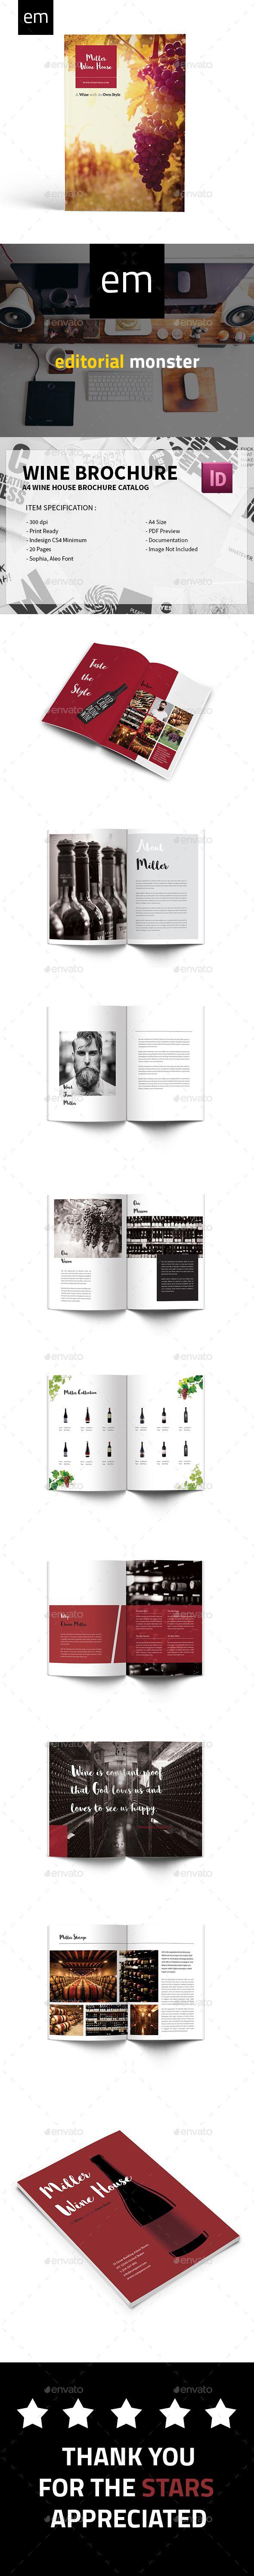 Wine Brochure Brochures Indesign Templates And Brochure Template